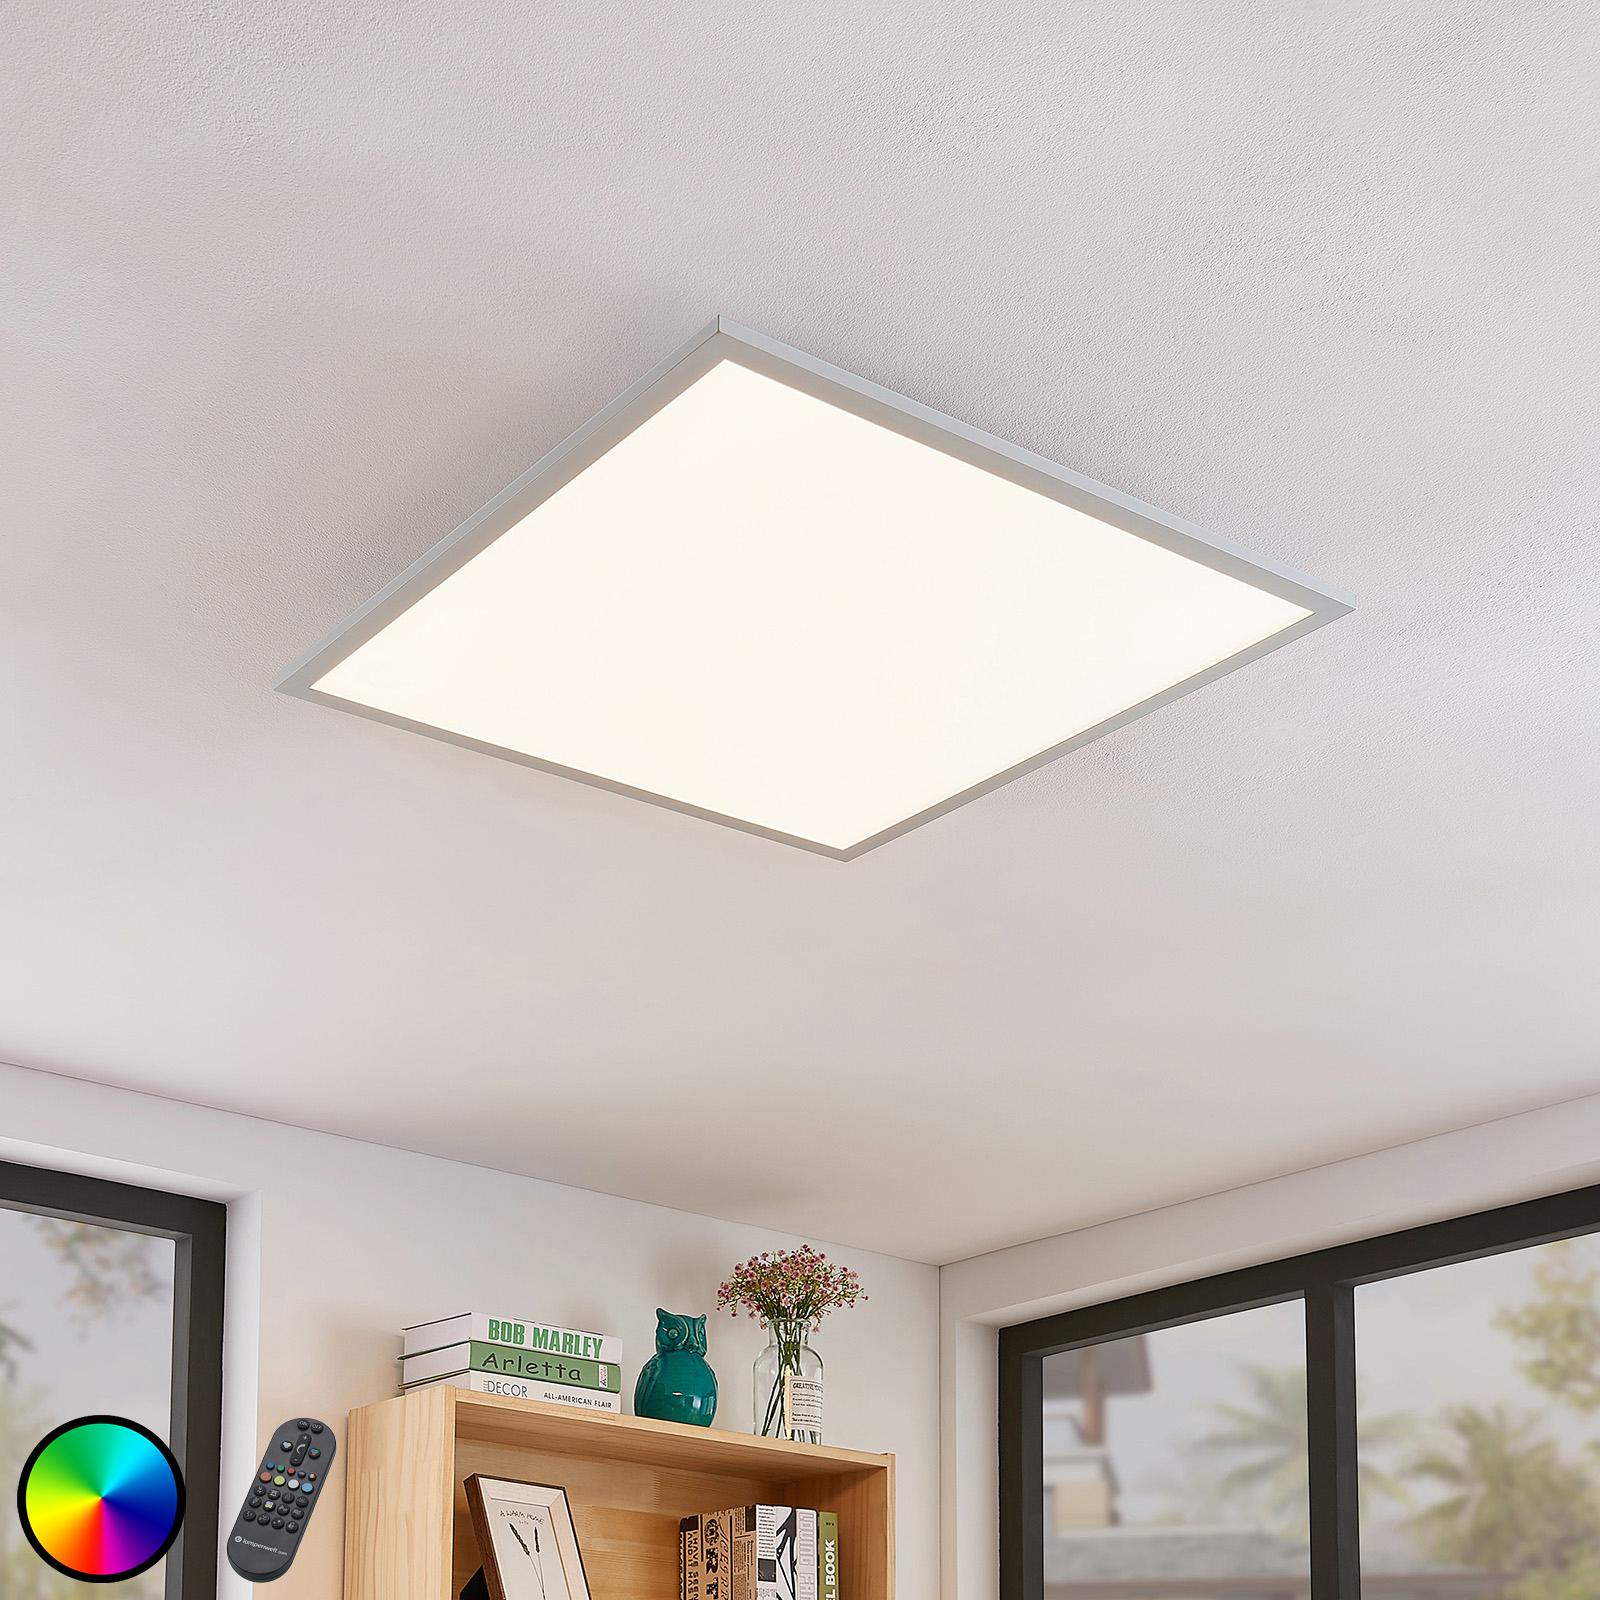 Lampa sufitowa LED Milian z pilotem 62x62cm